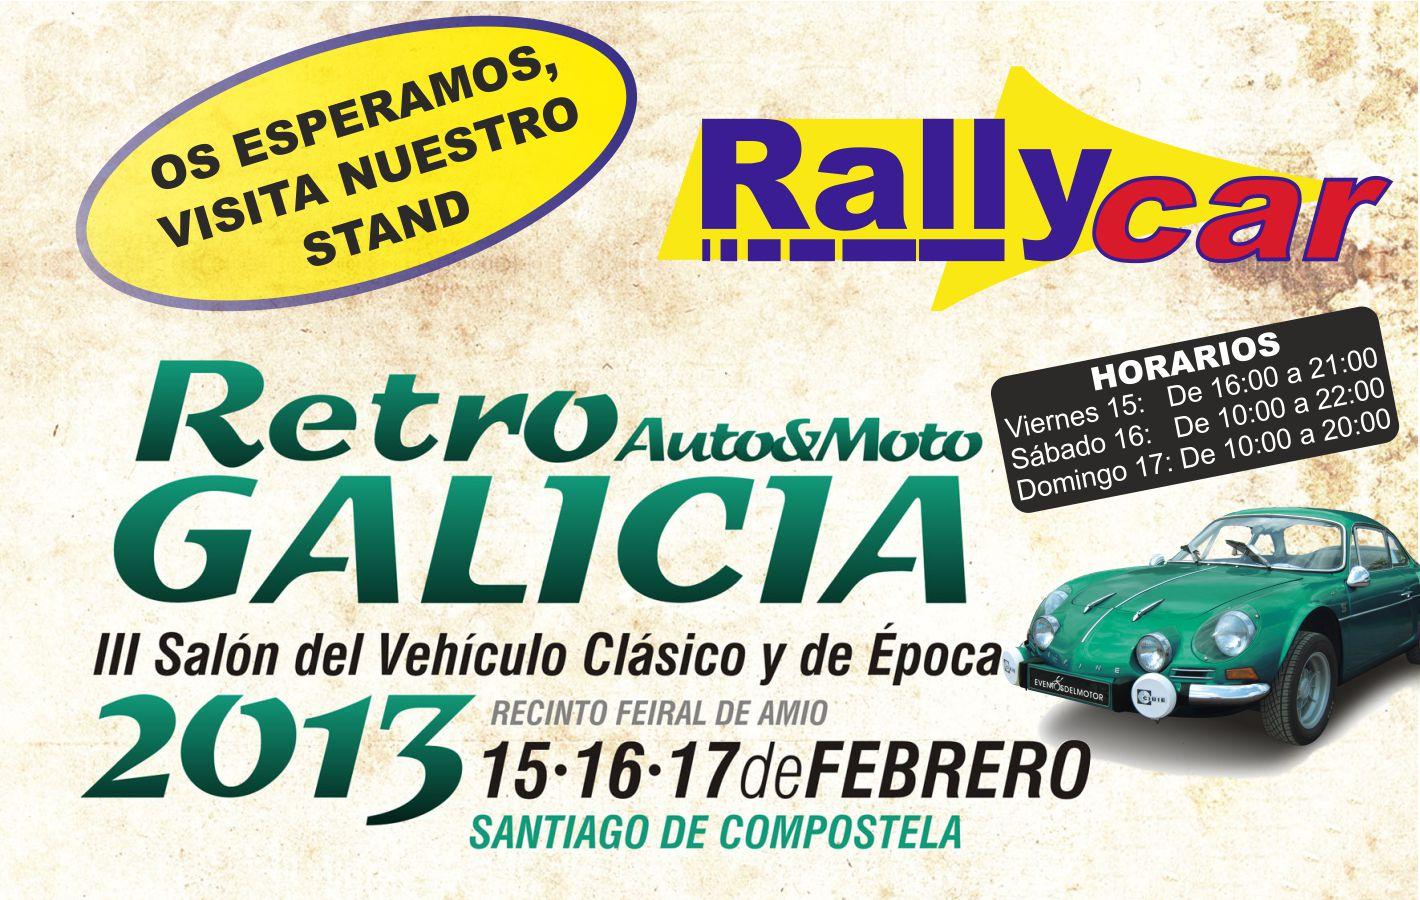 Rallycar presente en Retro Galicia